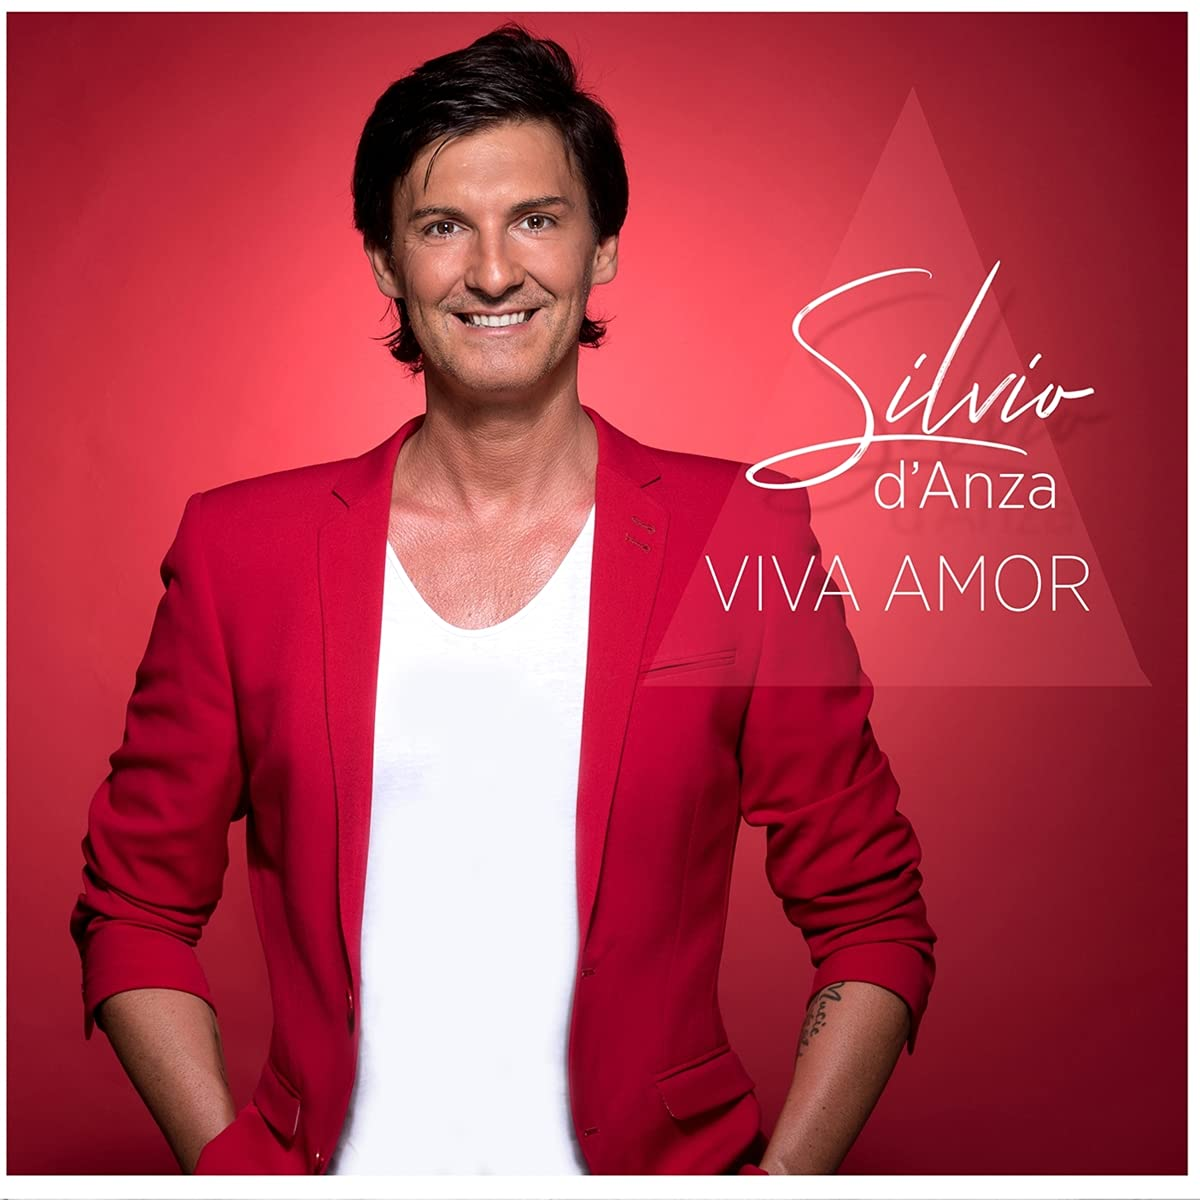 SILVIO D\'ANZA * Viva amor (CD)